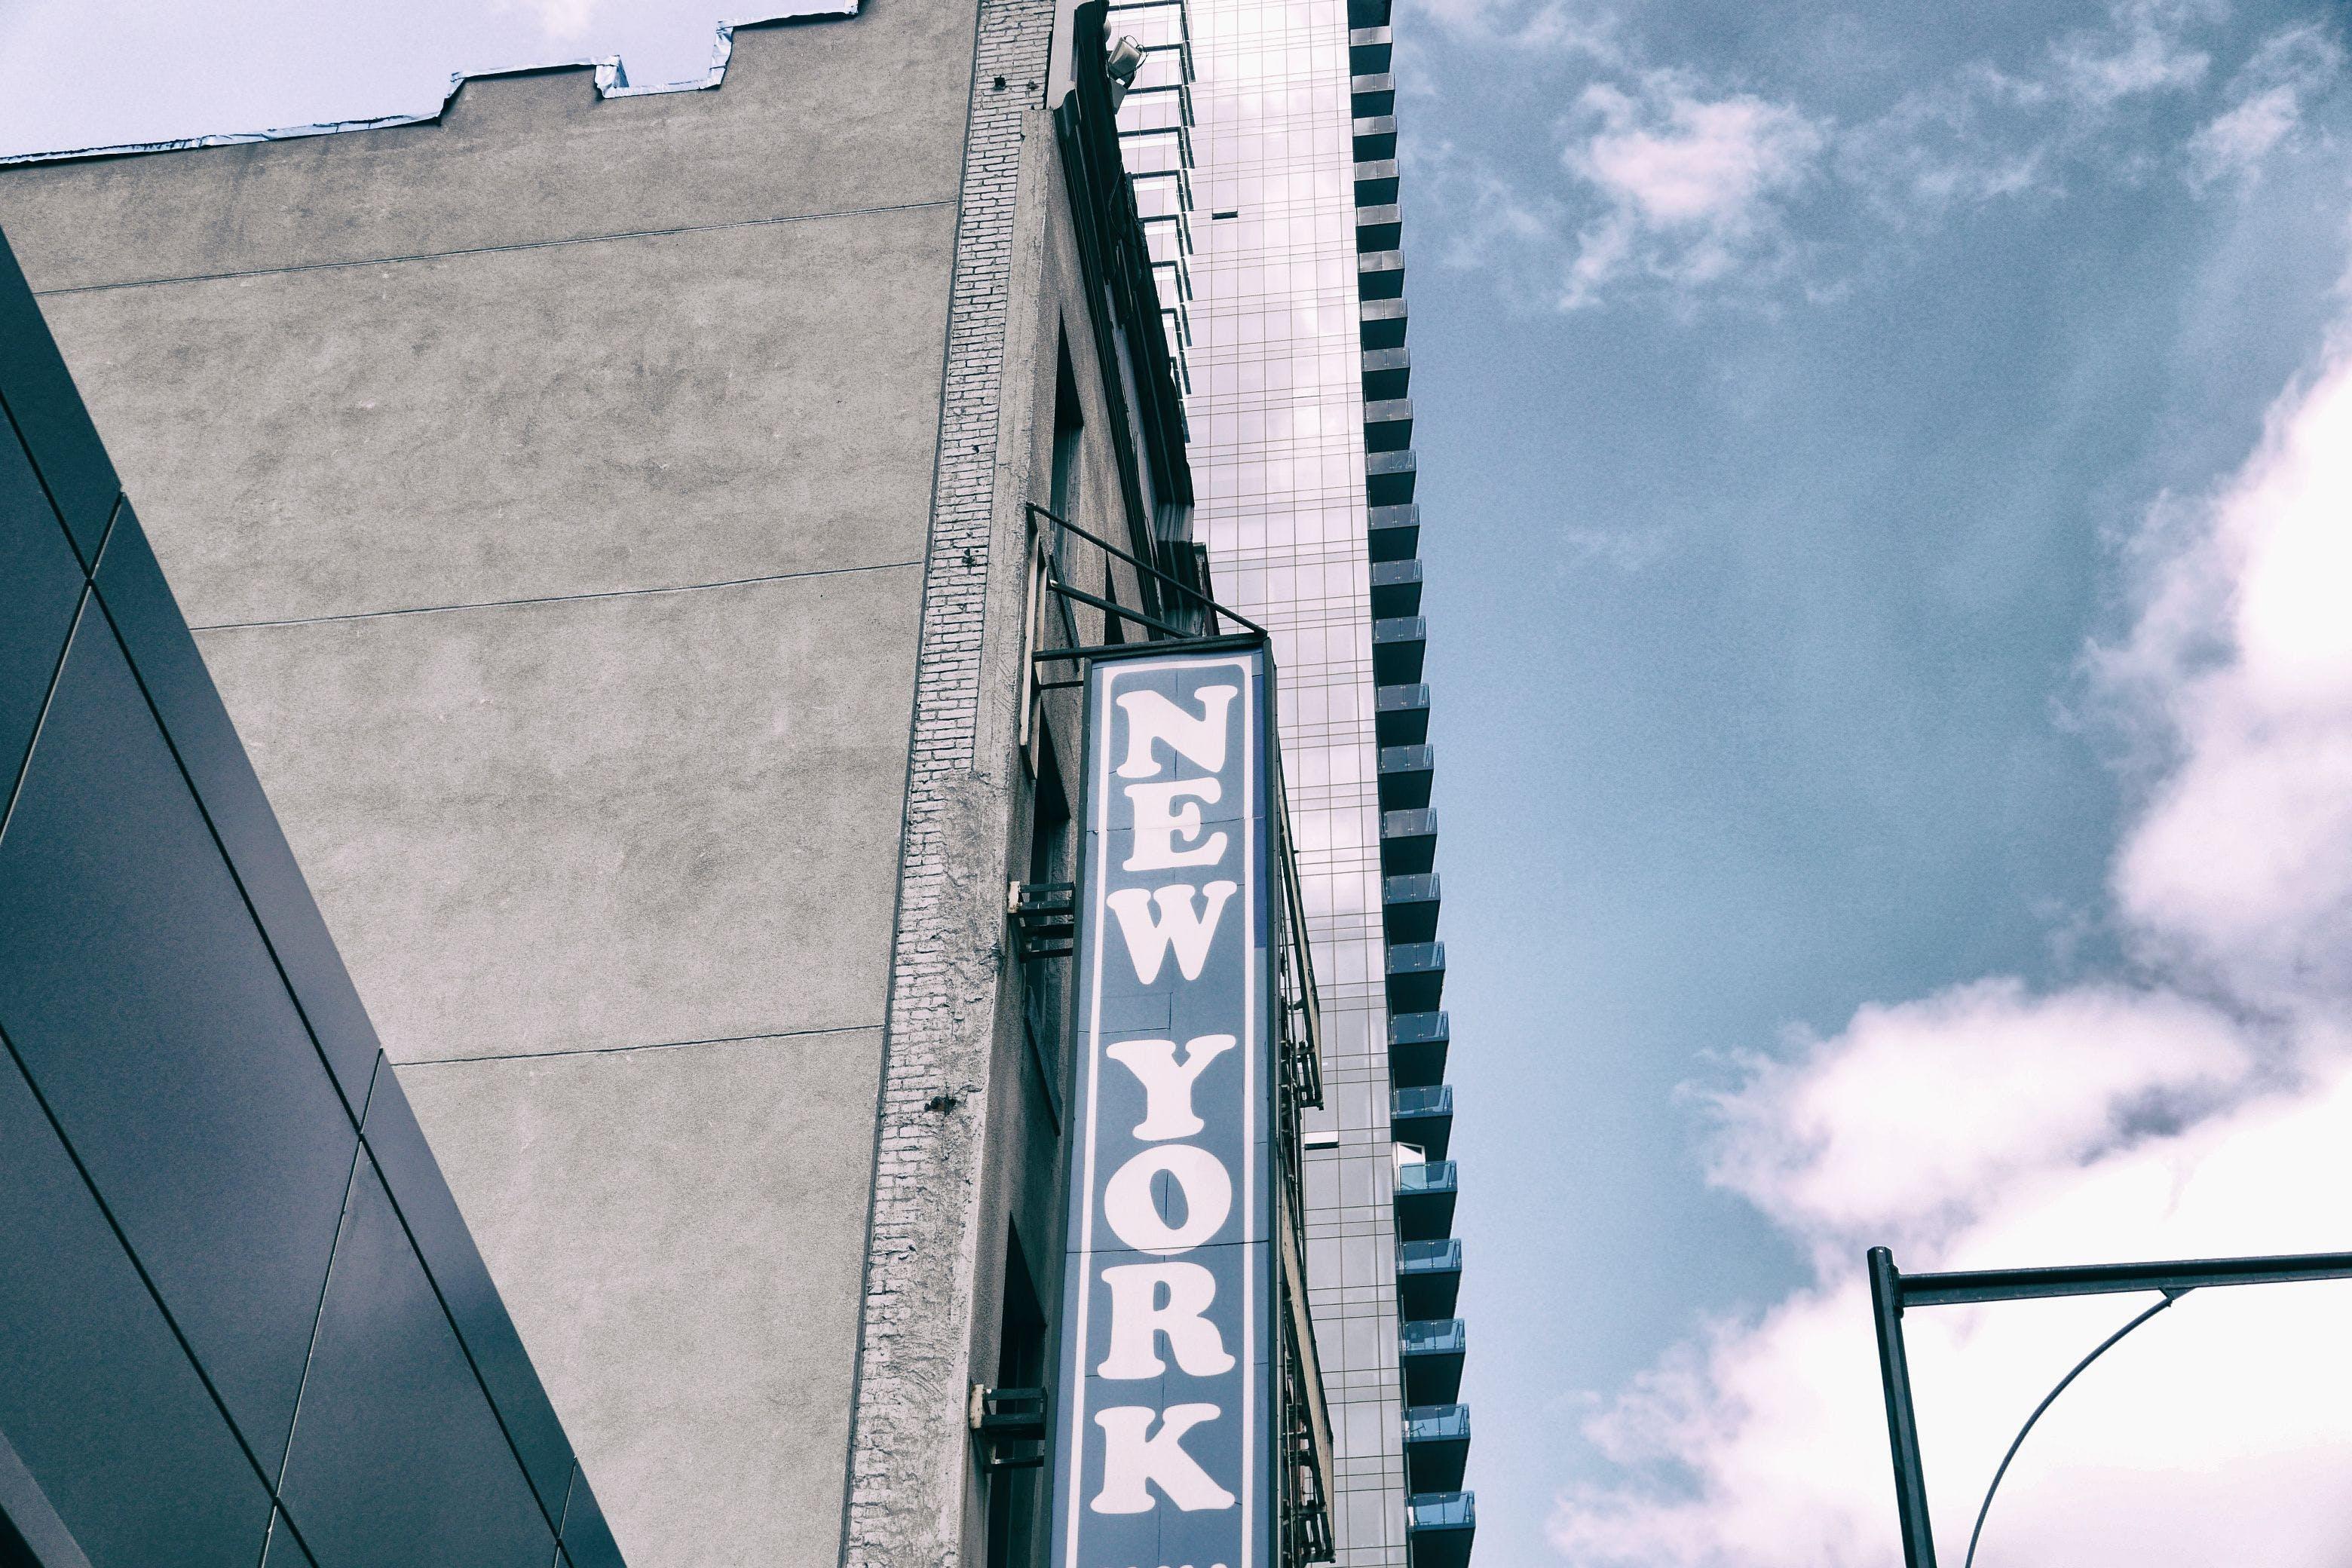 New York Signage at Daytime